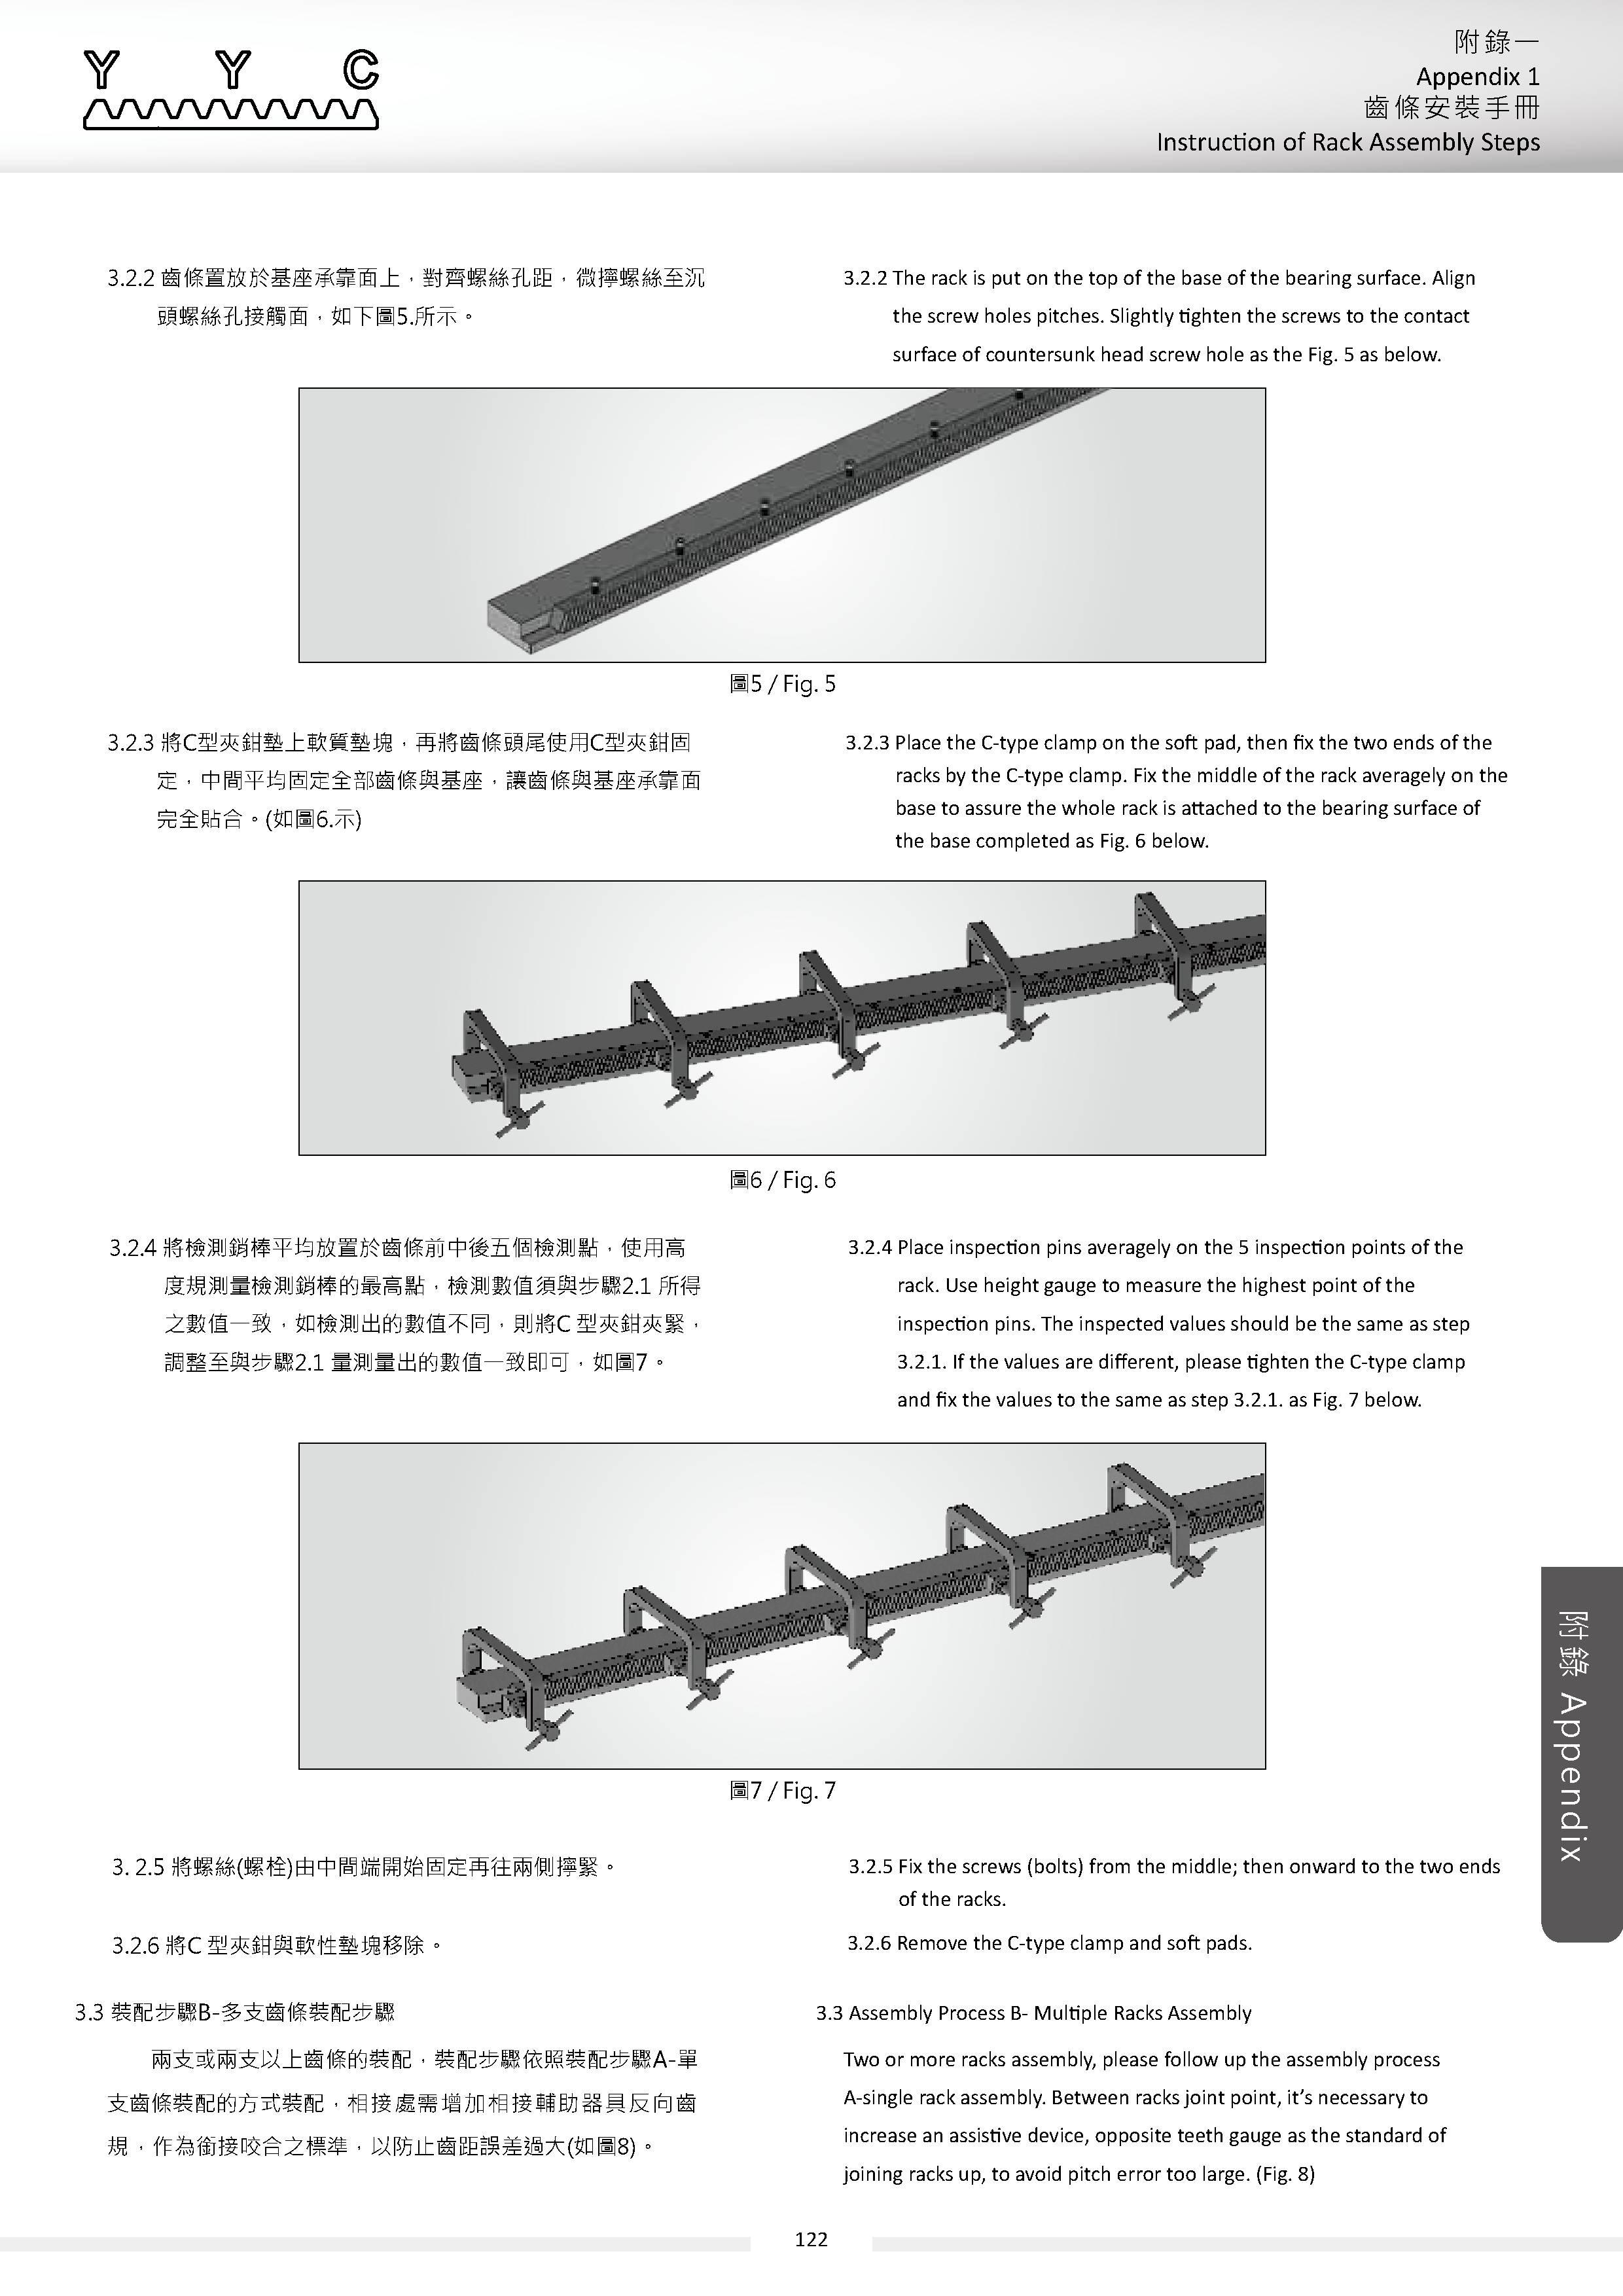 Instruction of Rack Assembly Steps 齒條安裝手冊4